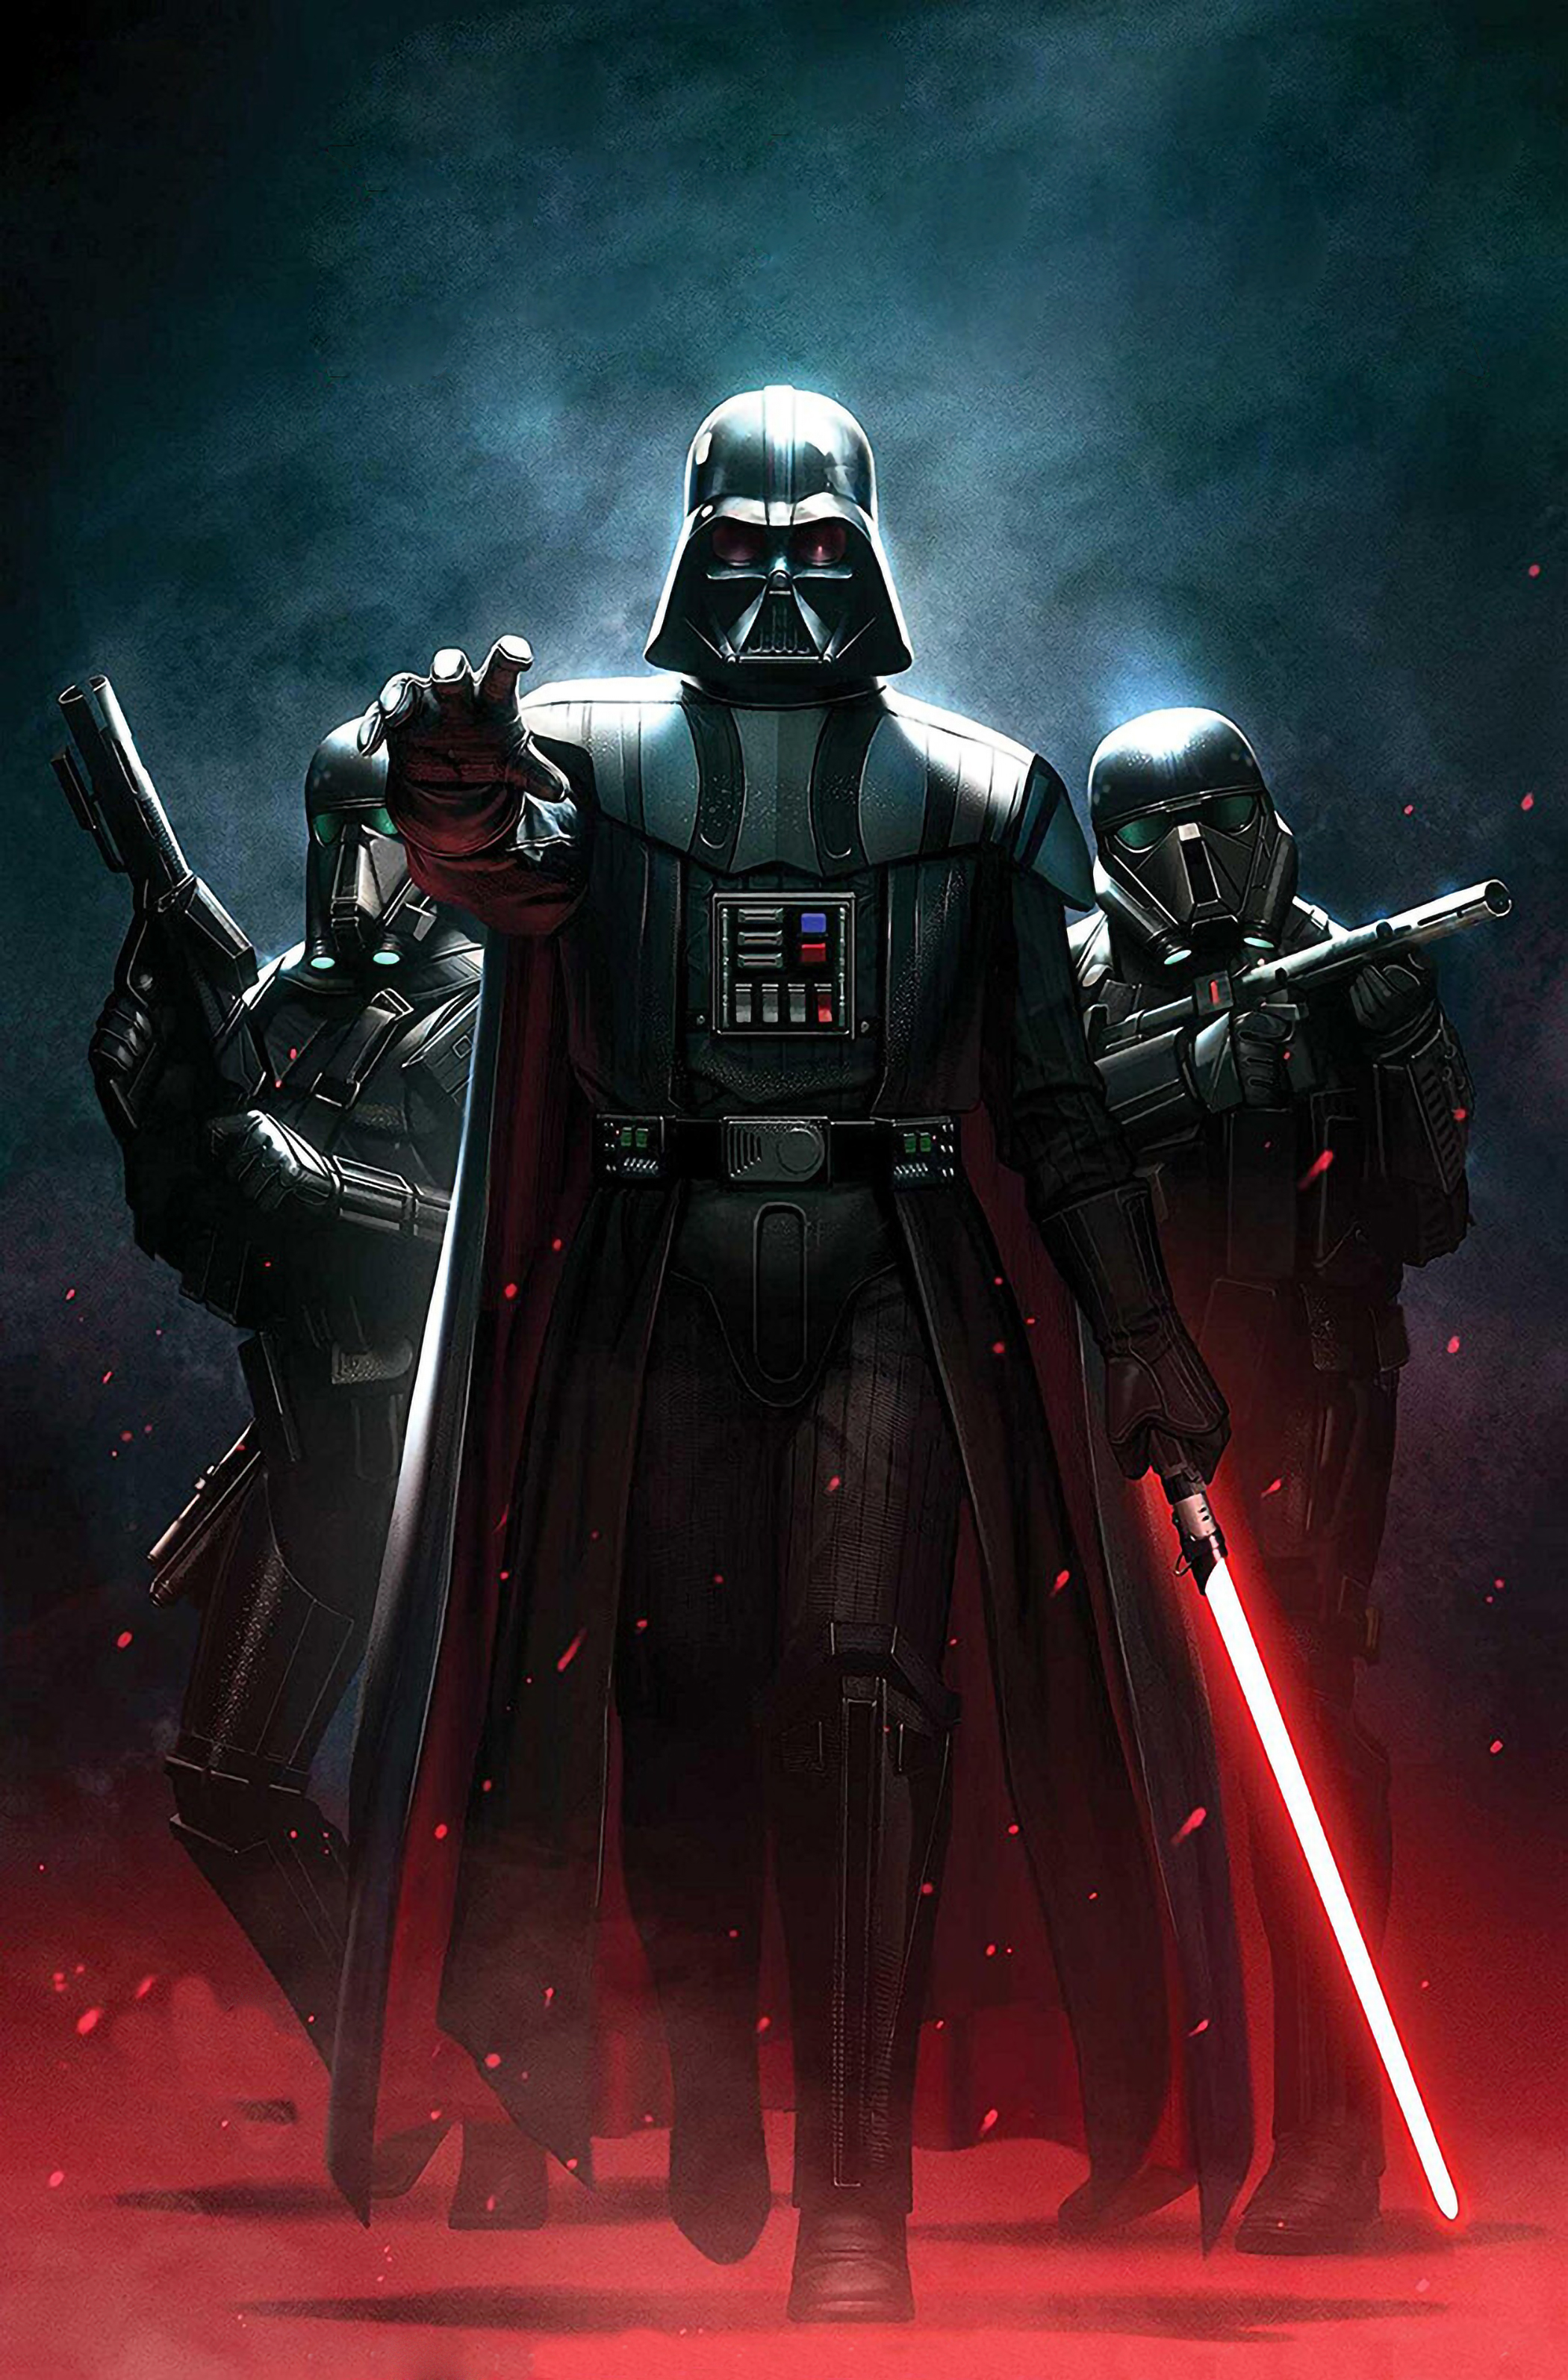 Darth Vedar Star Wars Art Wallpaper Hd Superheroes 4k